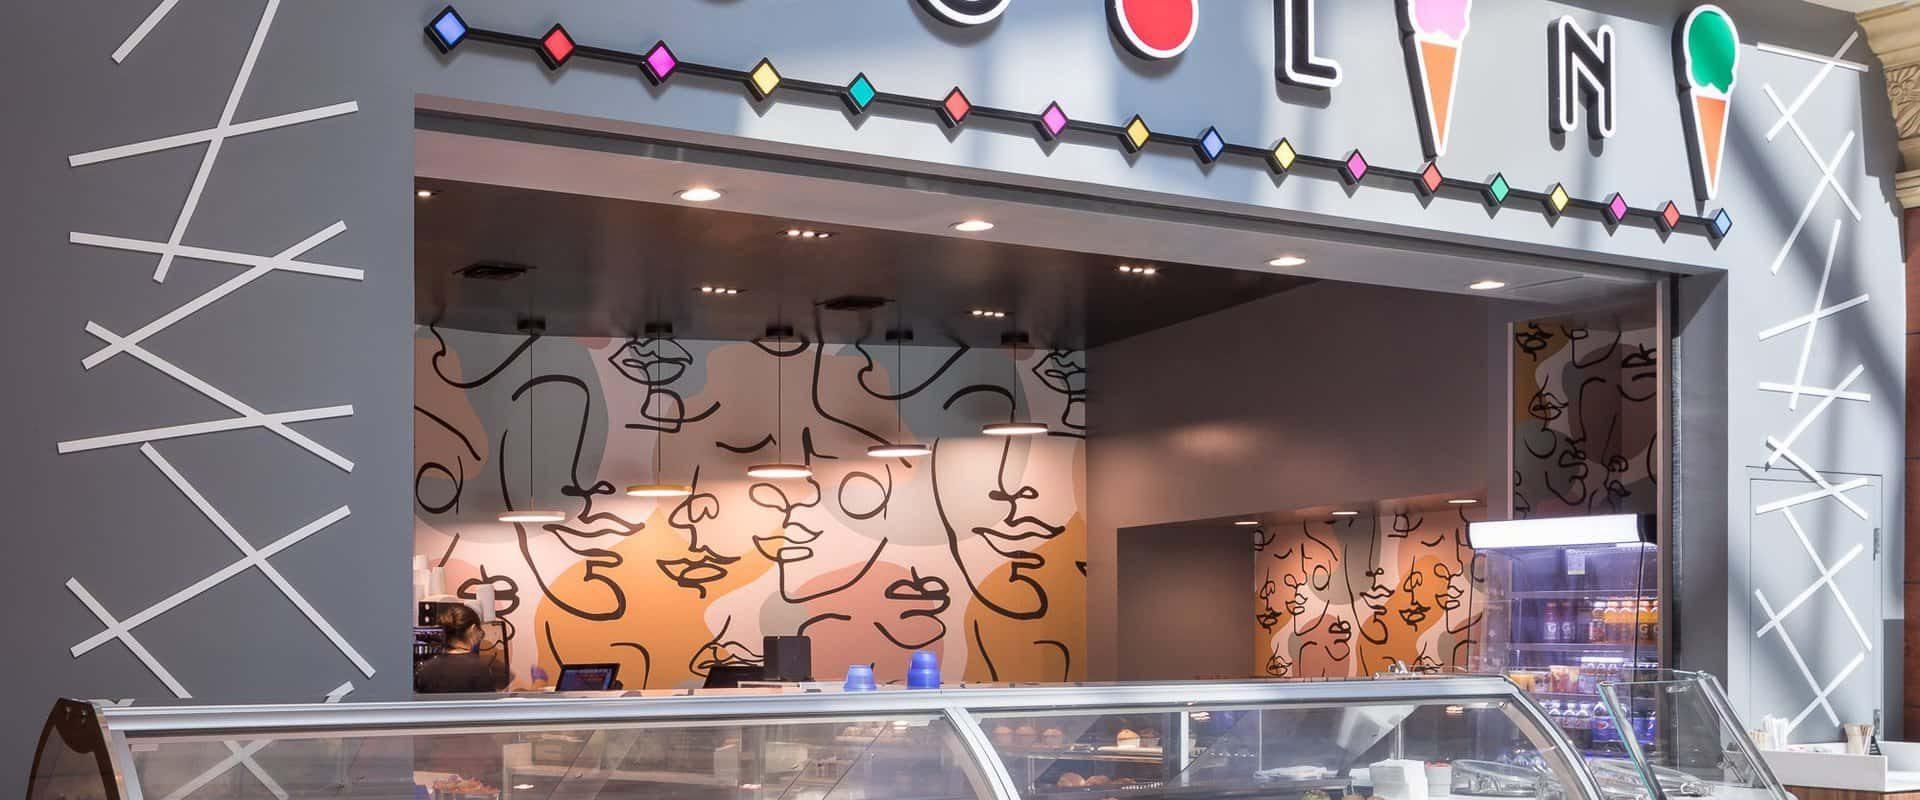 Cocolini gelato shop at Mandalay Place in Las Vegas, NV.